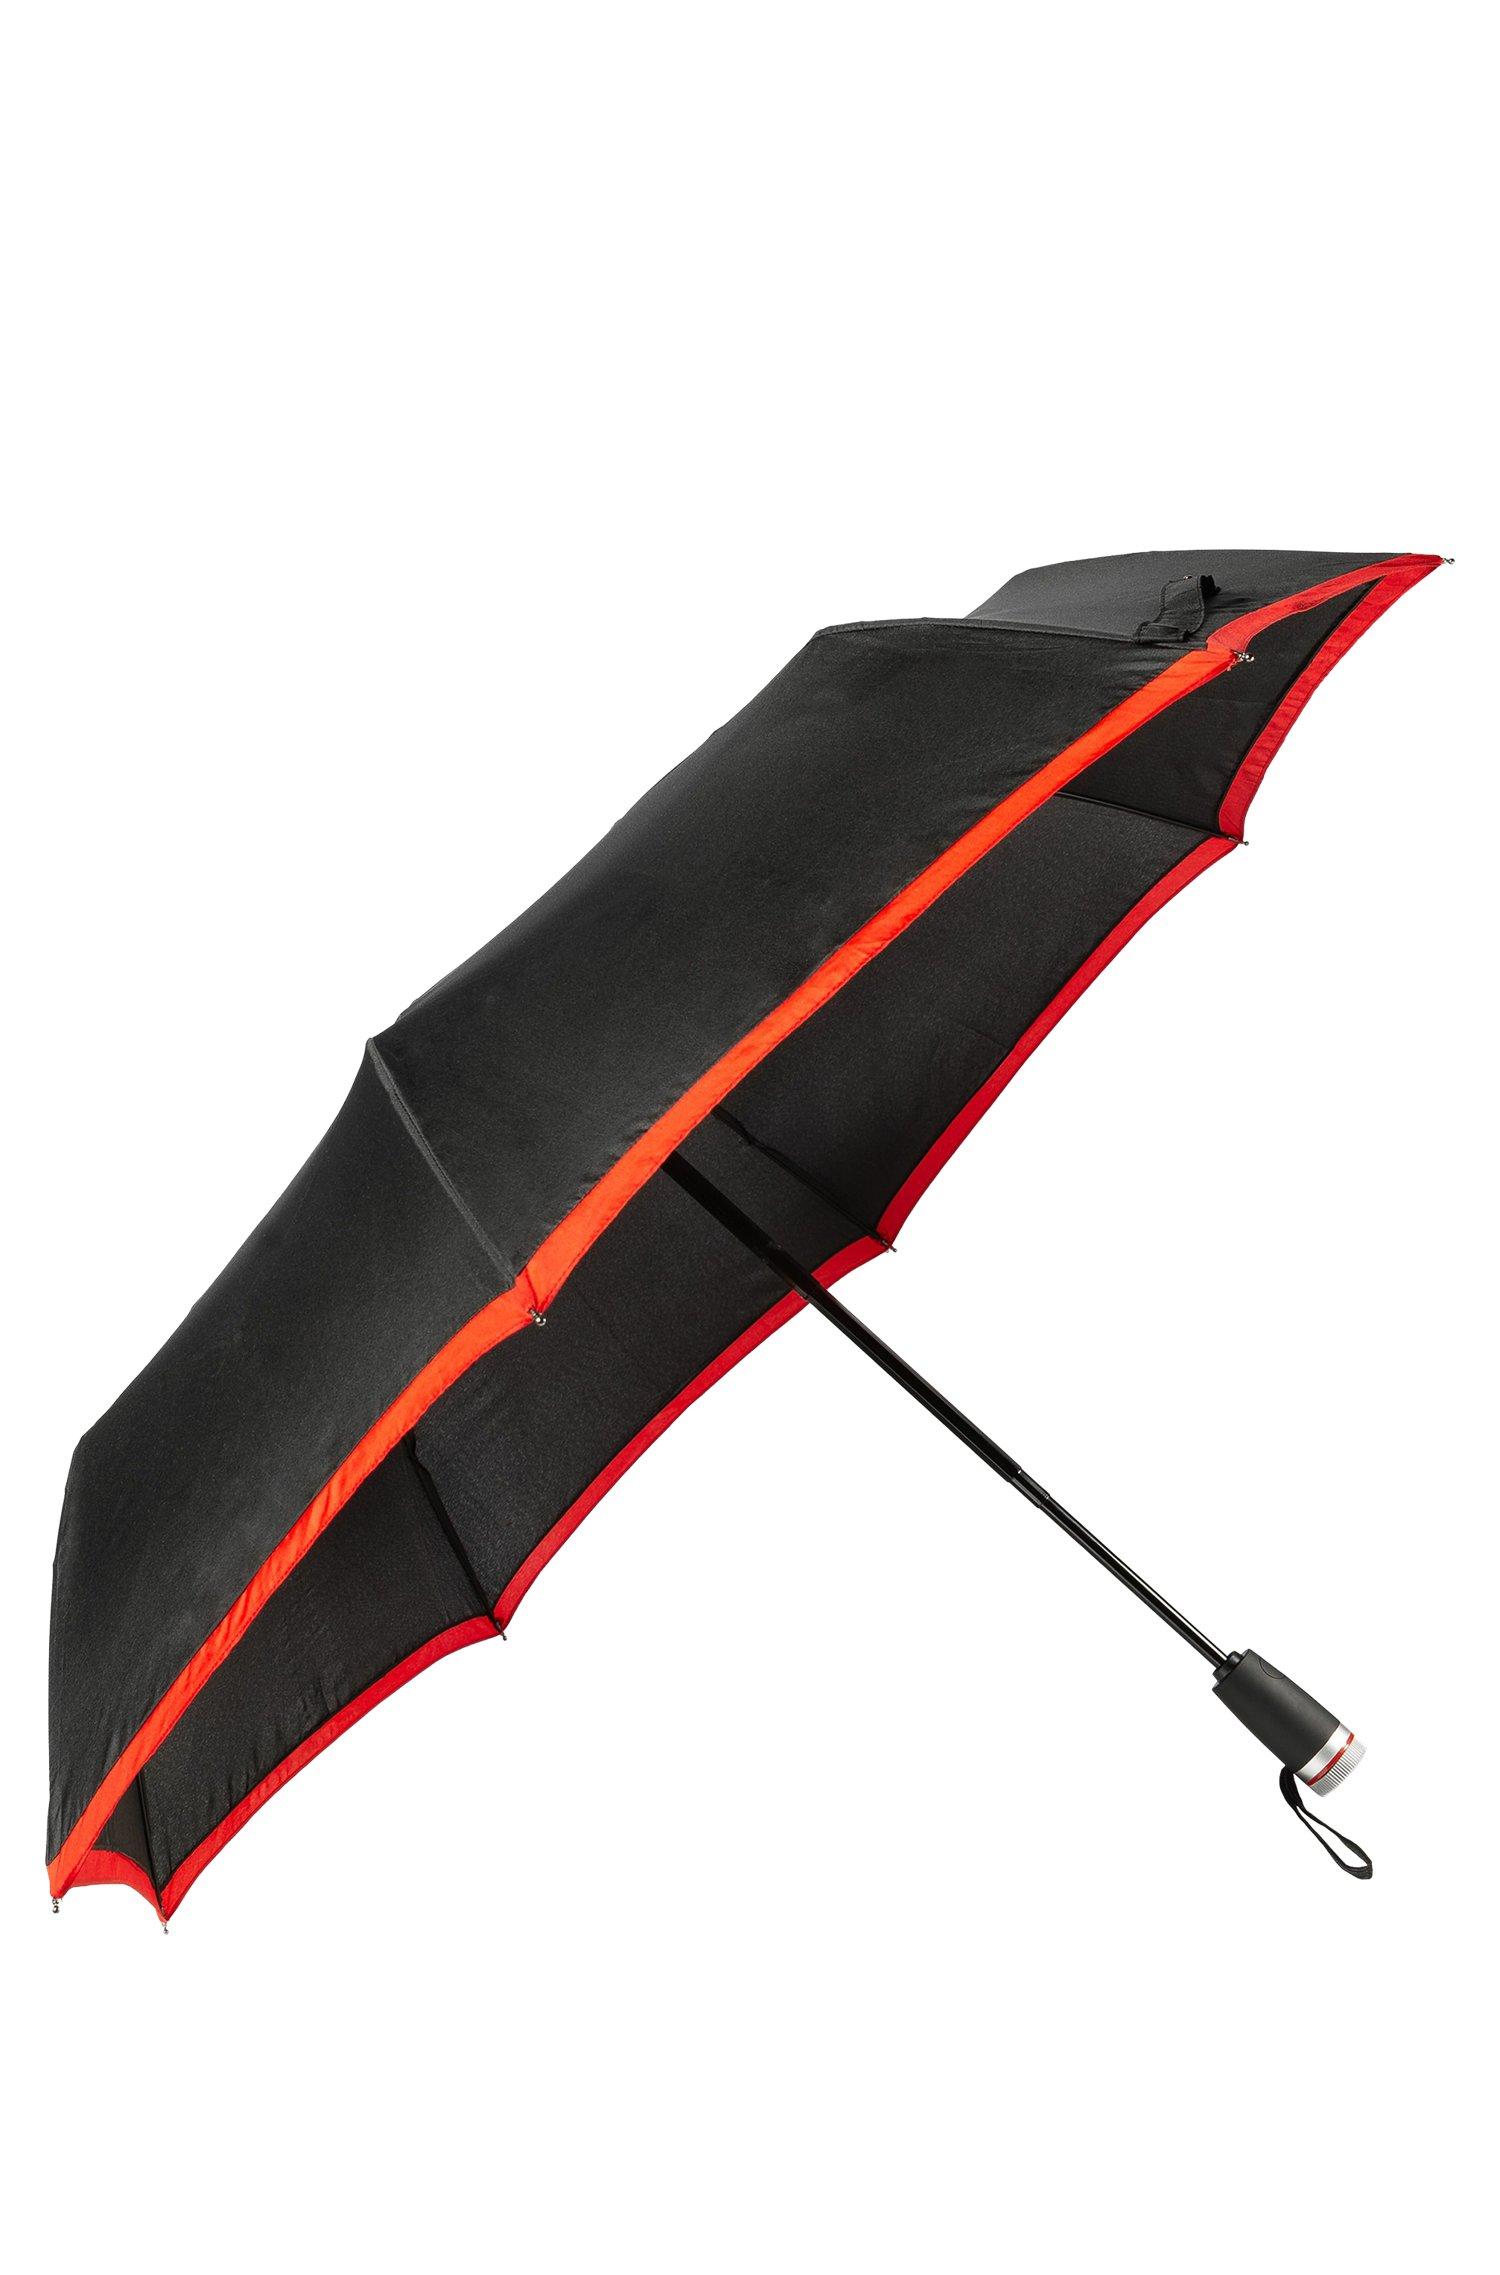 Pocket umbrella with red border, Black